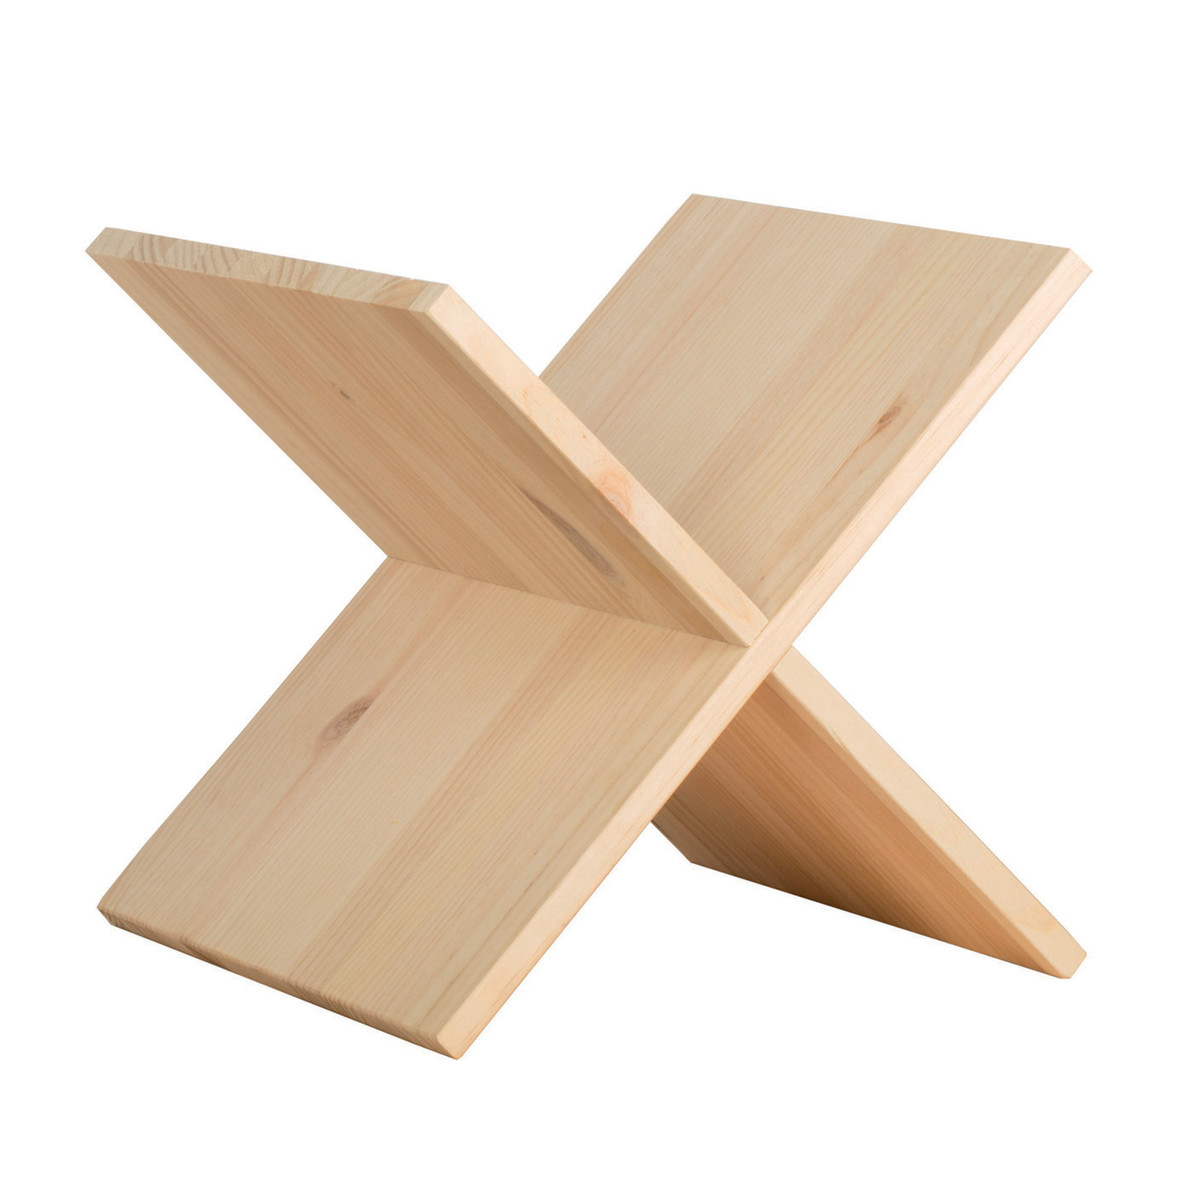 Scala a cubi ikea for Coprigradini per scale in legno ikea